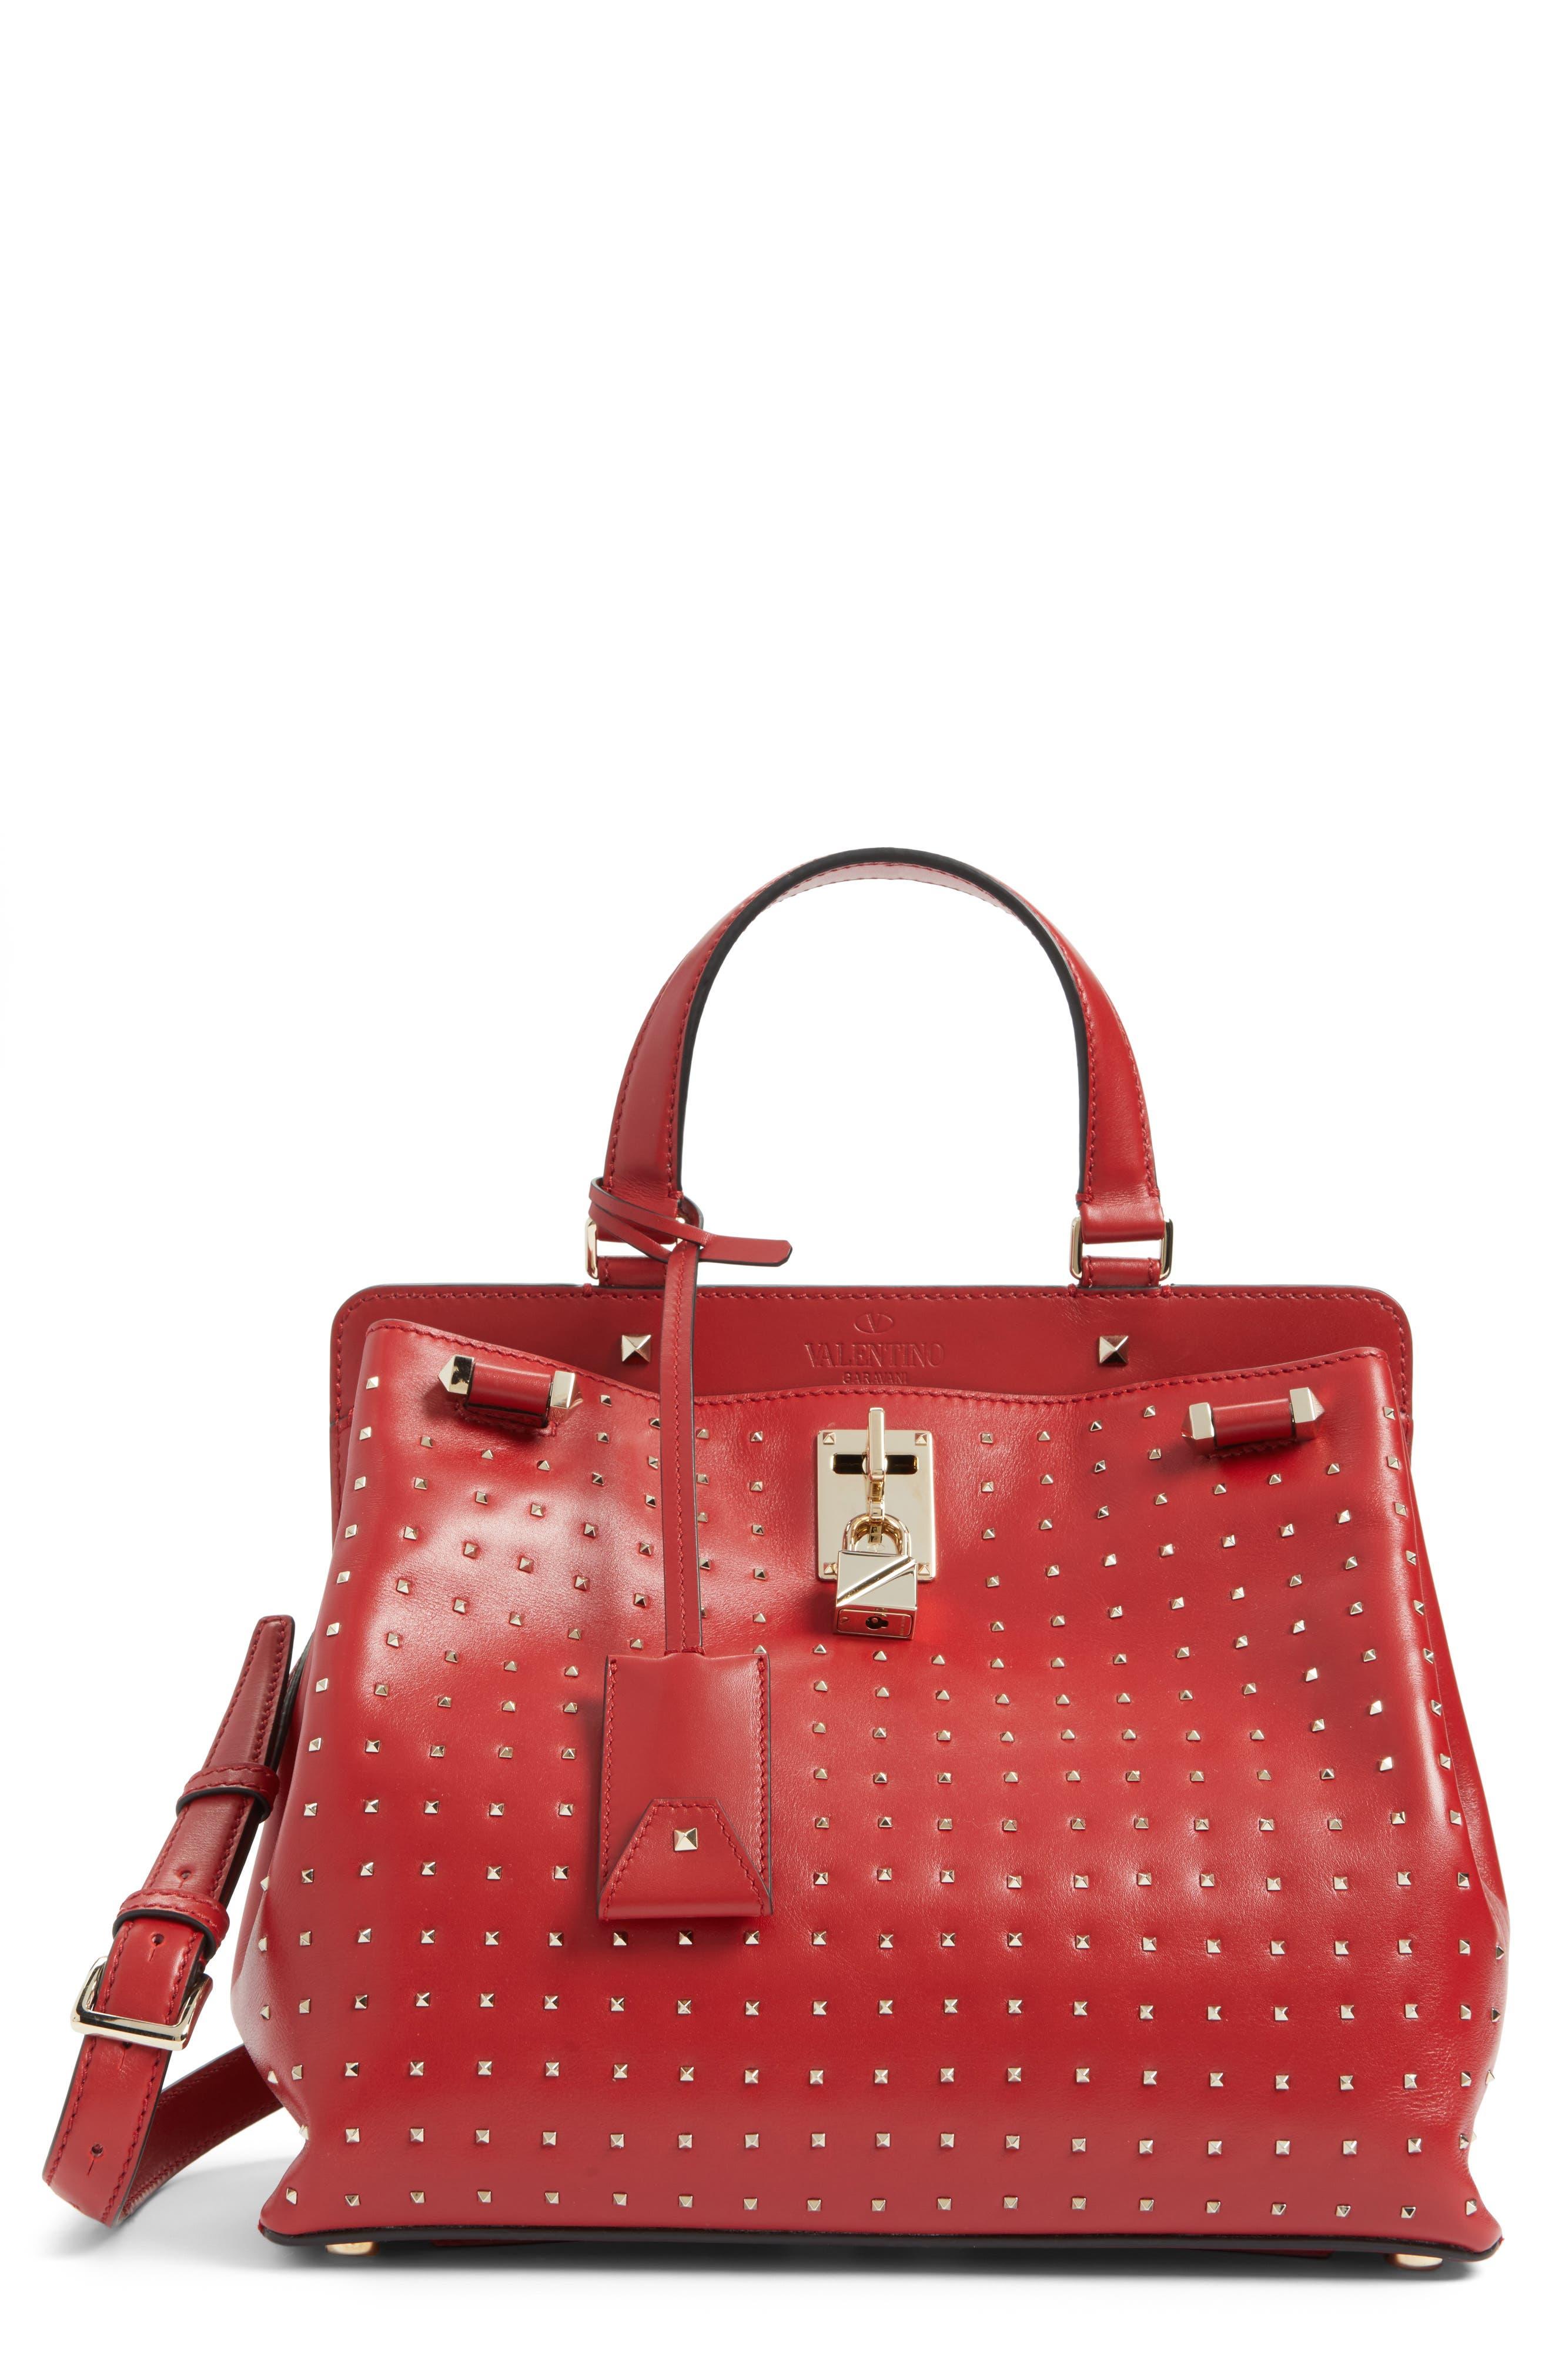 VALENTINO GARAVANI Medium Pieper Studded Leather Satchel